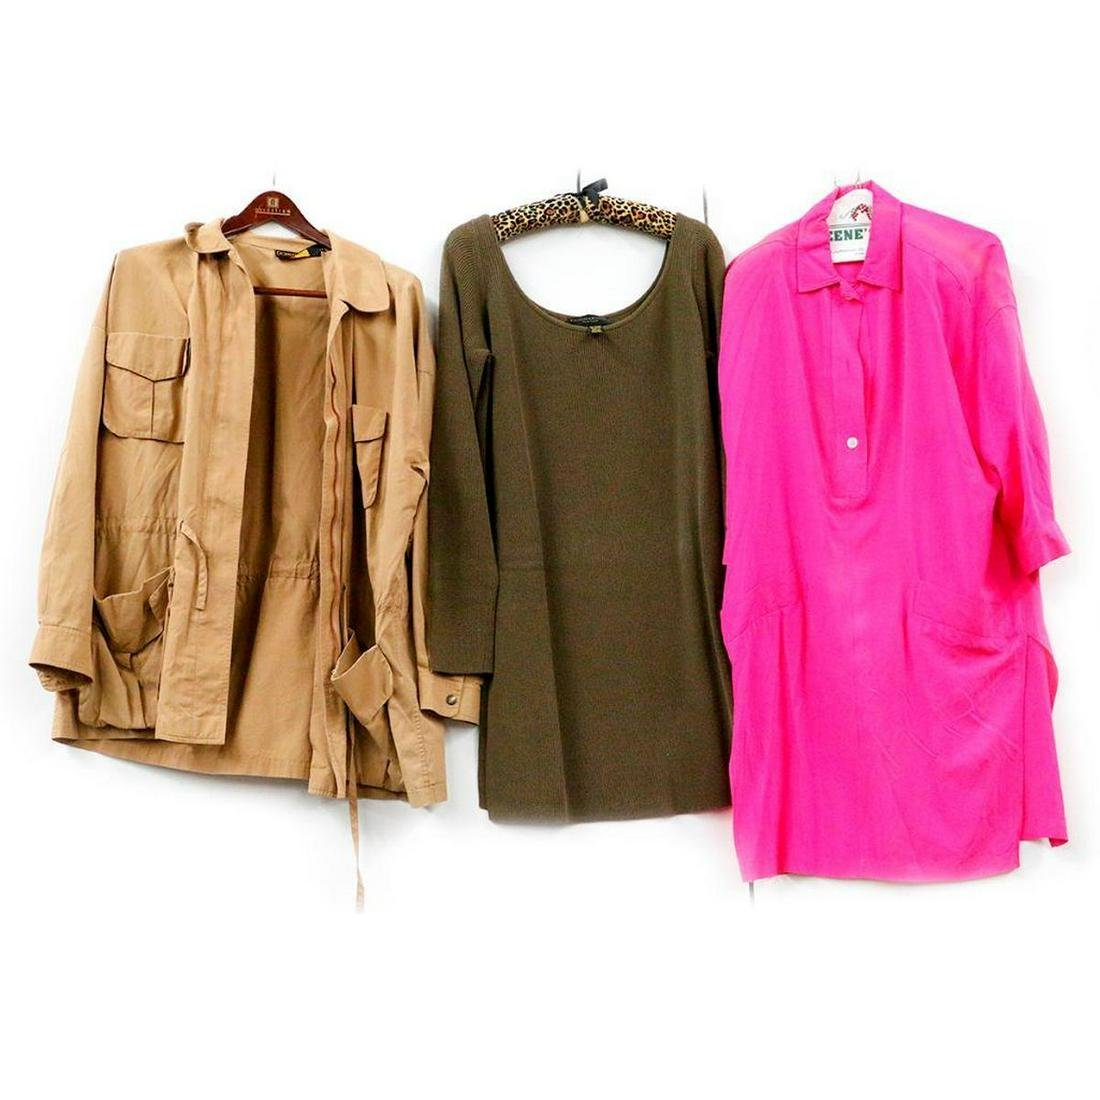 Vintage Donna Karan Clothing